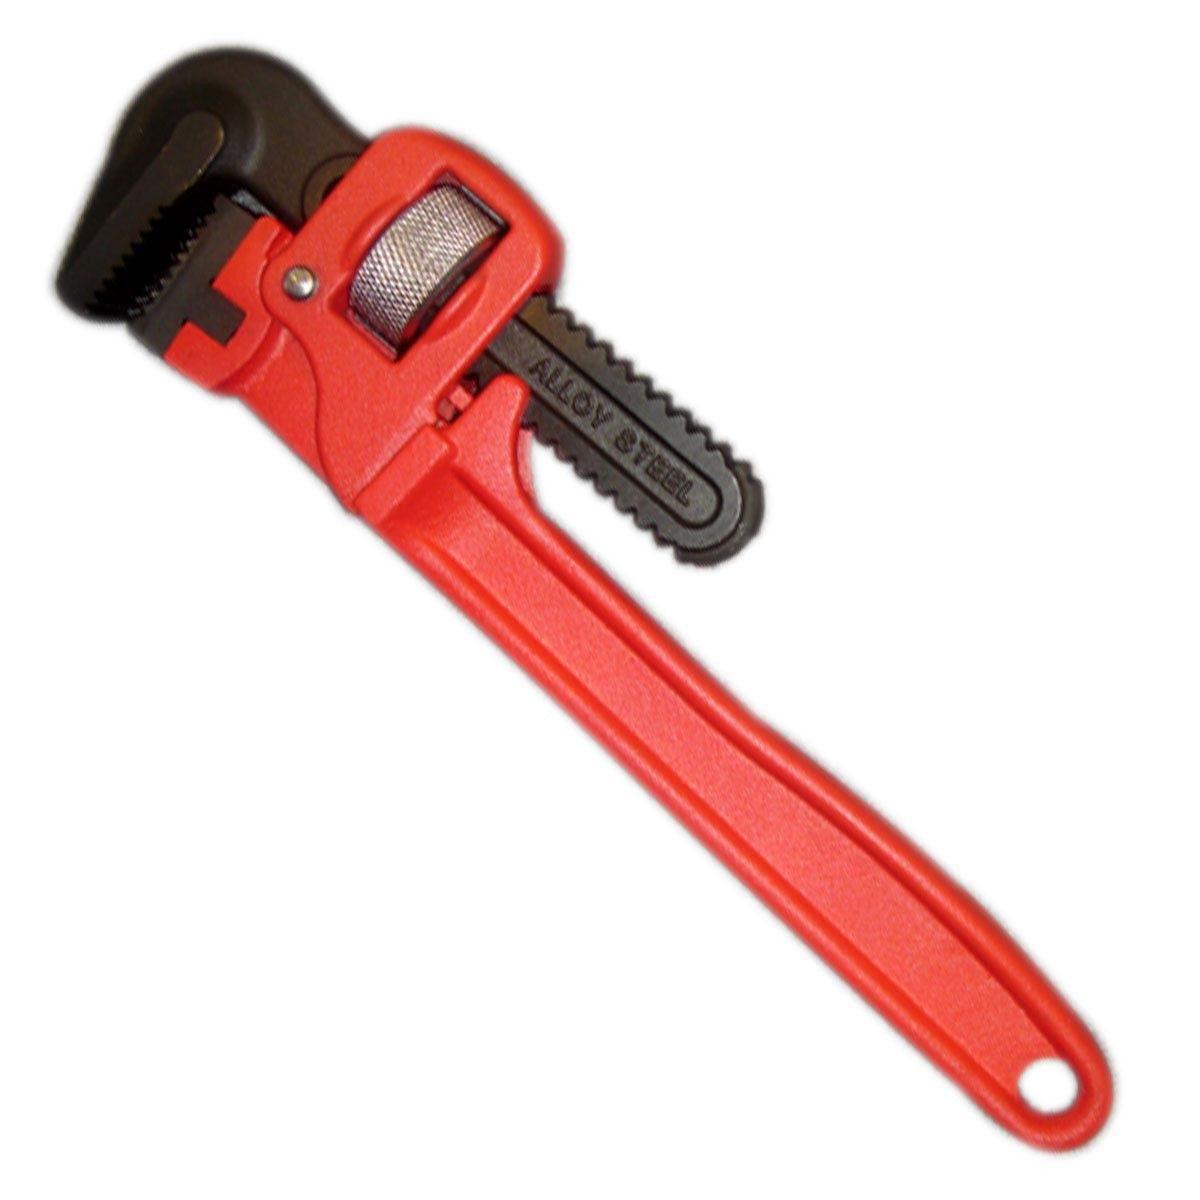 Super Heavy Duty Pipe Wrench Wg 29 18 Decoraport Canada